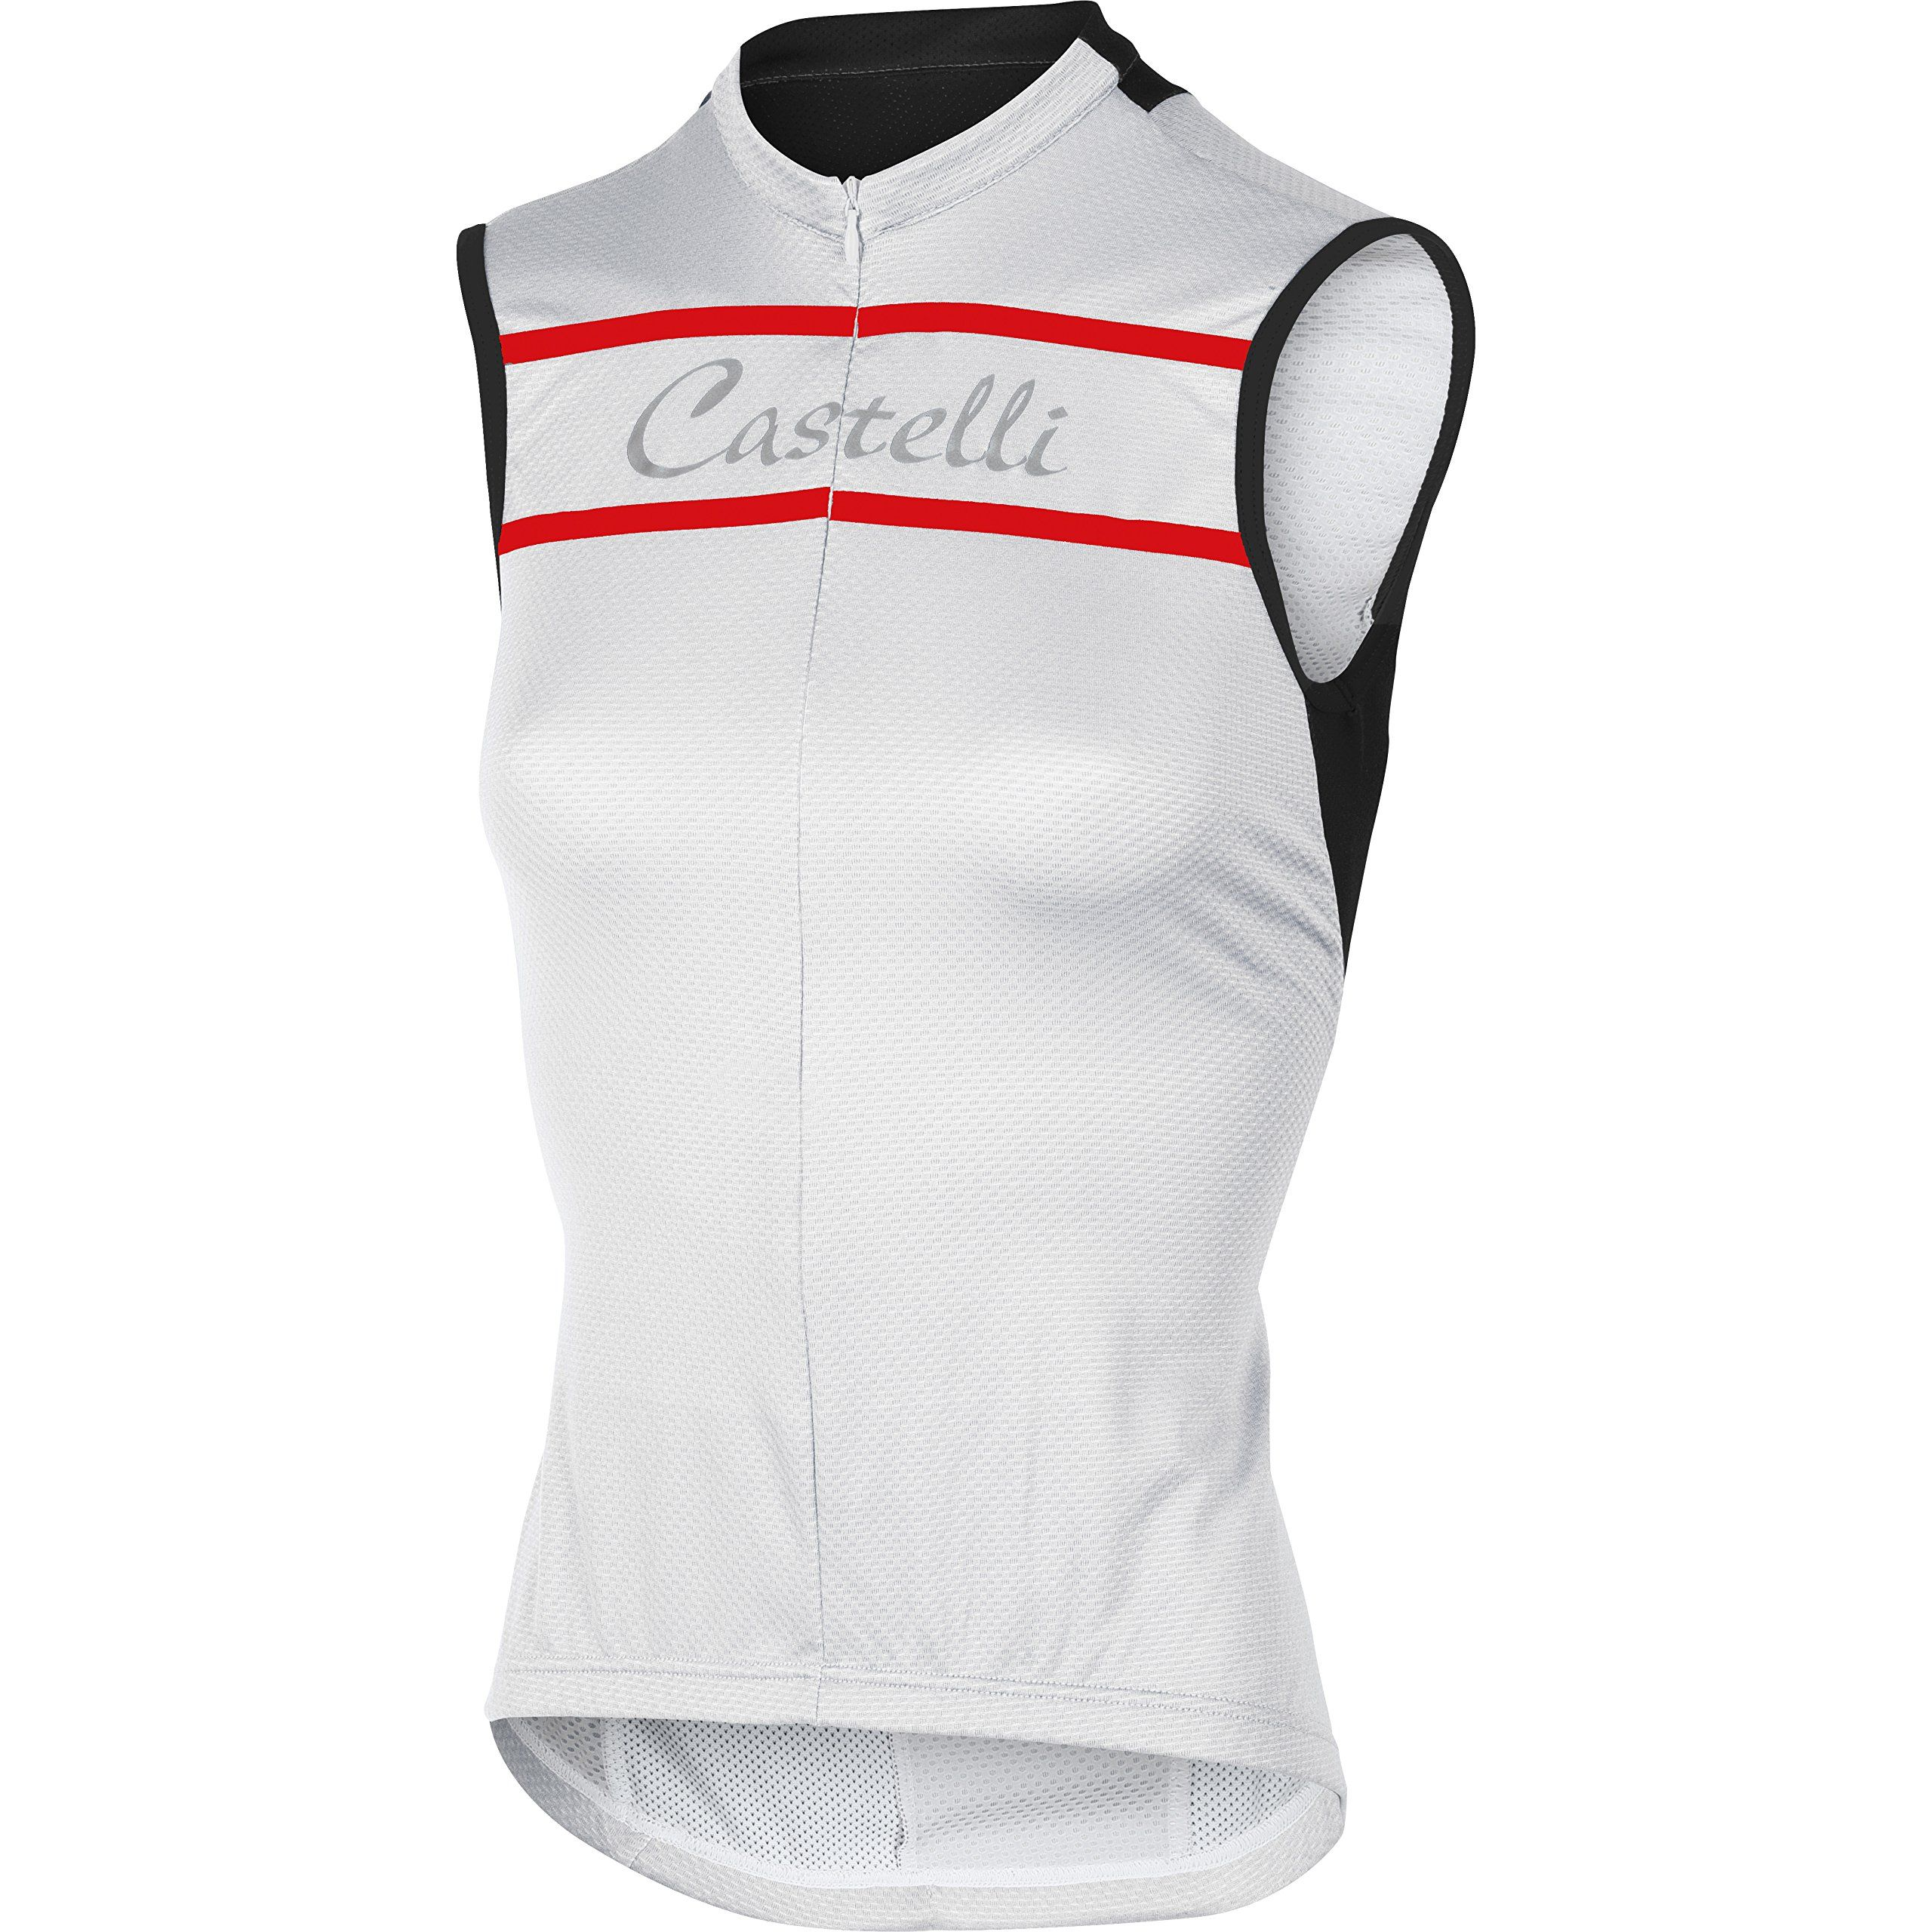 60e2aeb5a26718 Castelli Promessa Jersey - Sleeveless - Women s White